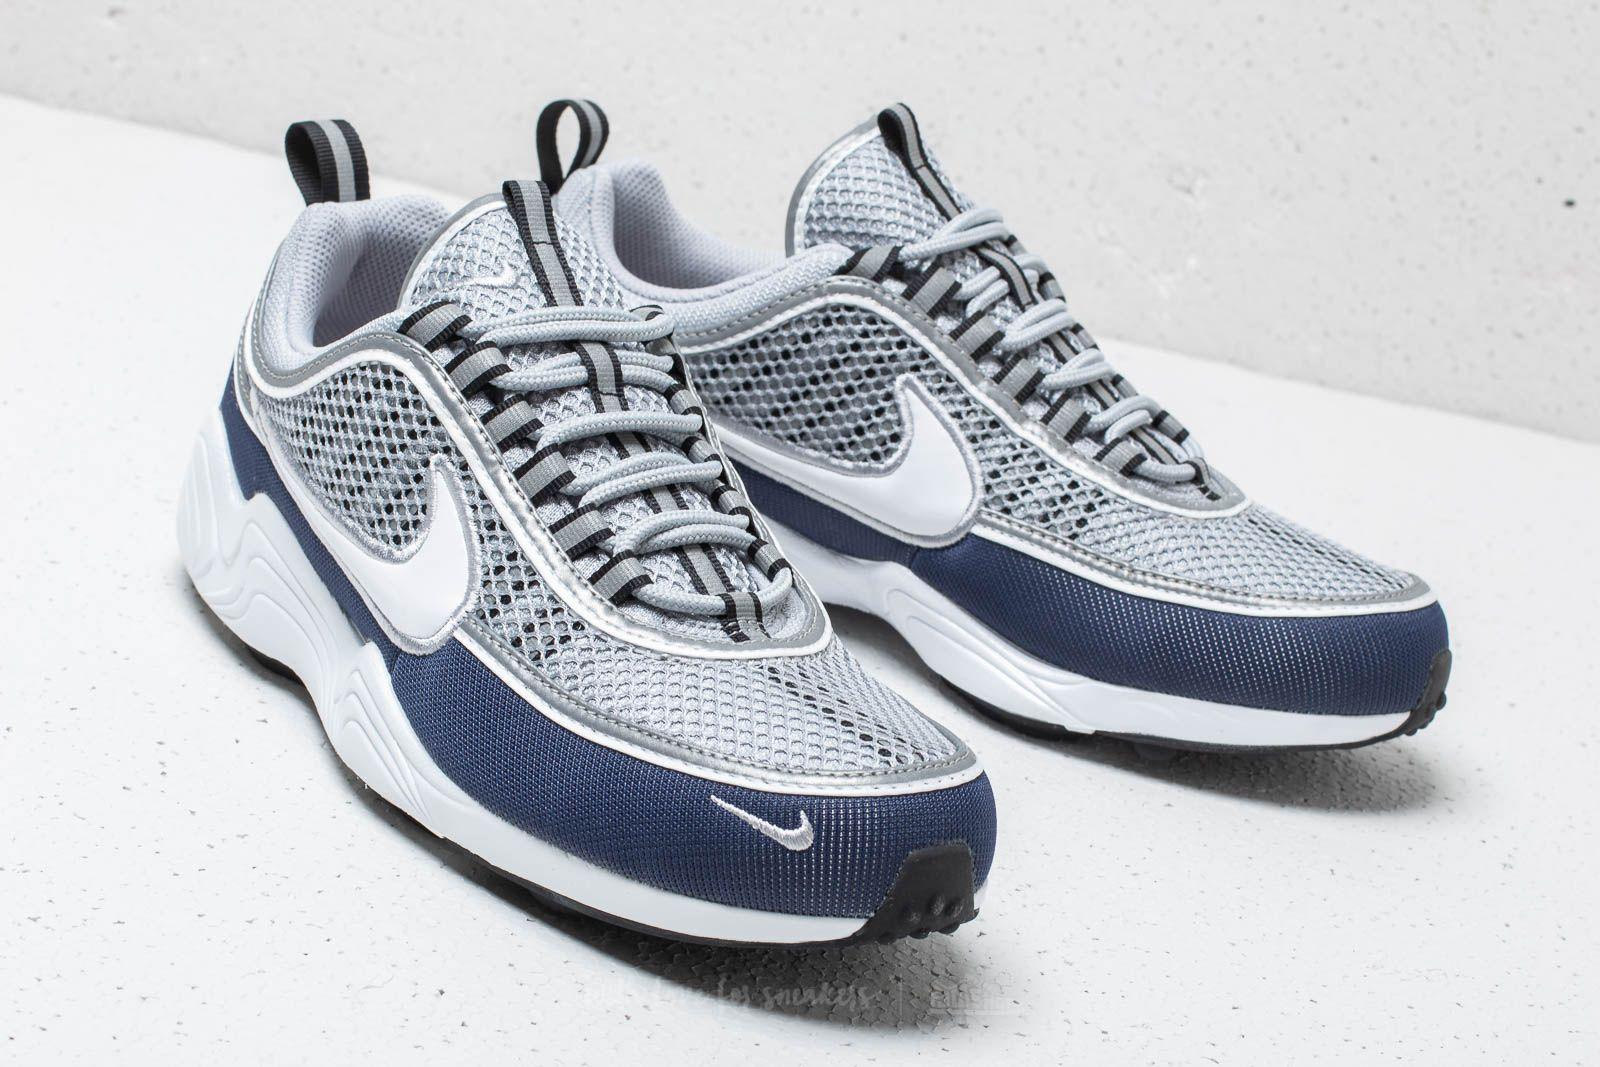 Nike Air Zoom Spiridon '16 Wolf Grey White Midnight Navy